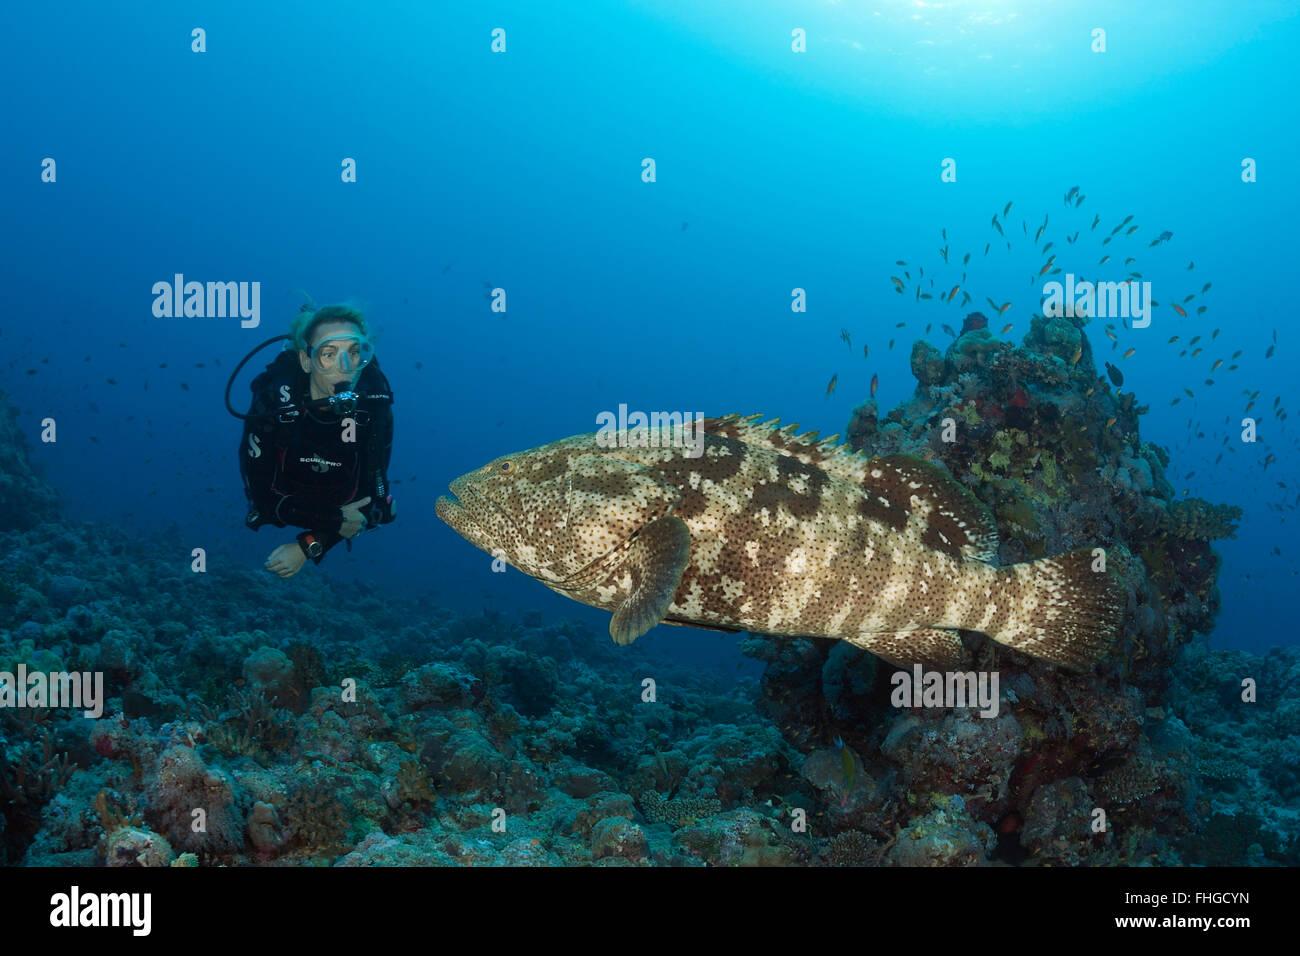 Scuba Diver and Malabar Grouper, Epinephelus malabaricus, Red Sea, Ras Mohammed, Egypt - Stock Image